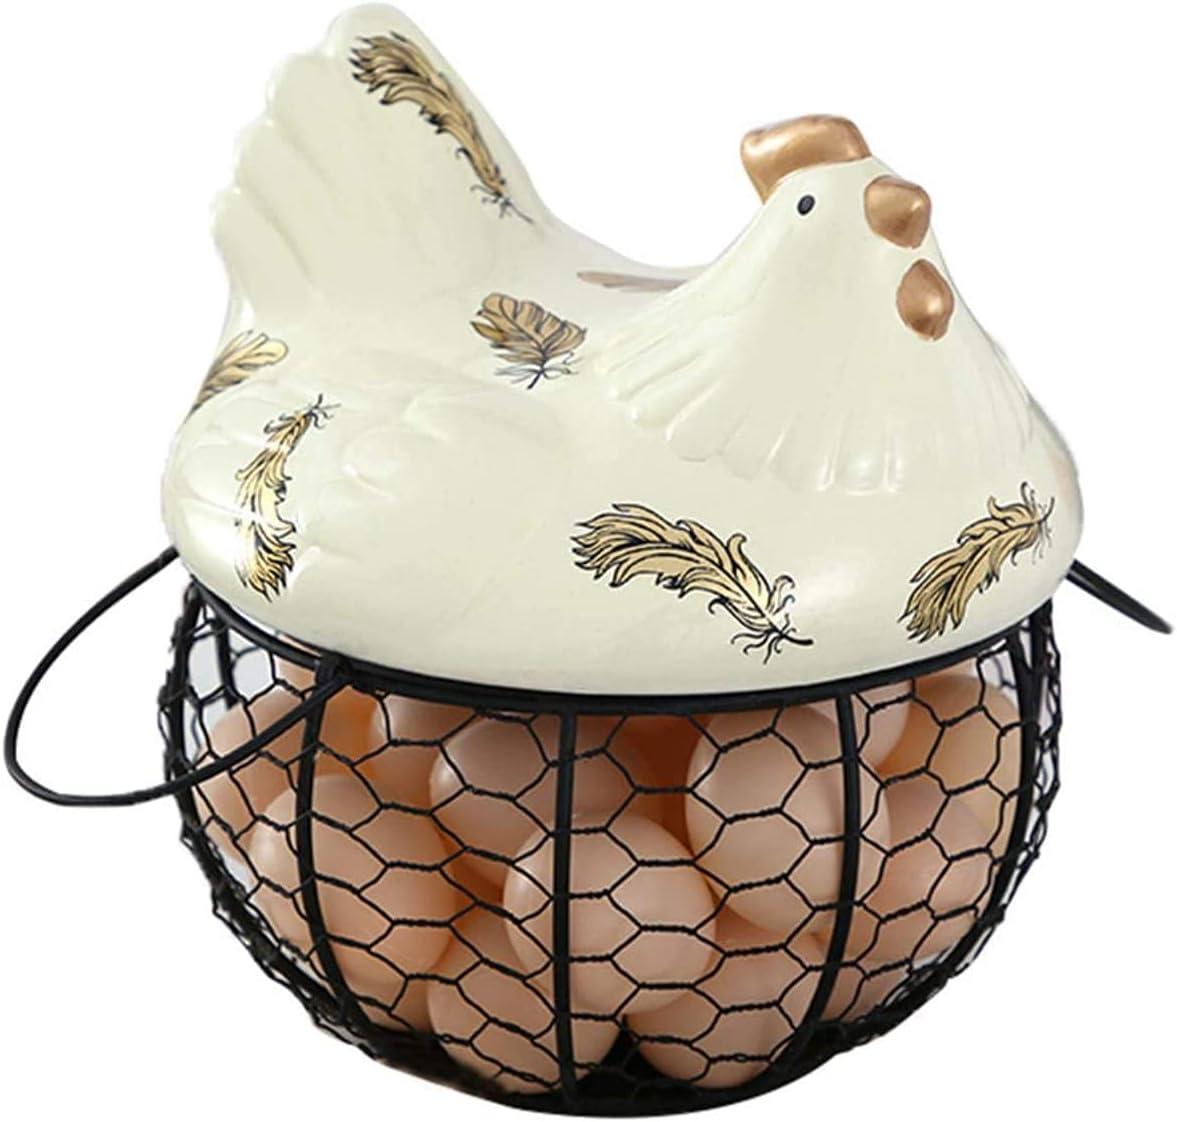 egg basket for fresh eggs Max 63% OFF Egg Basket Metal Max 48% OFF Eg Mesh Storage Wire